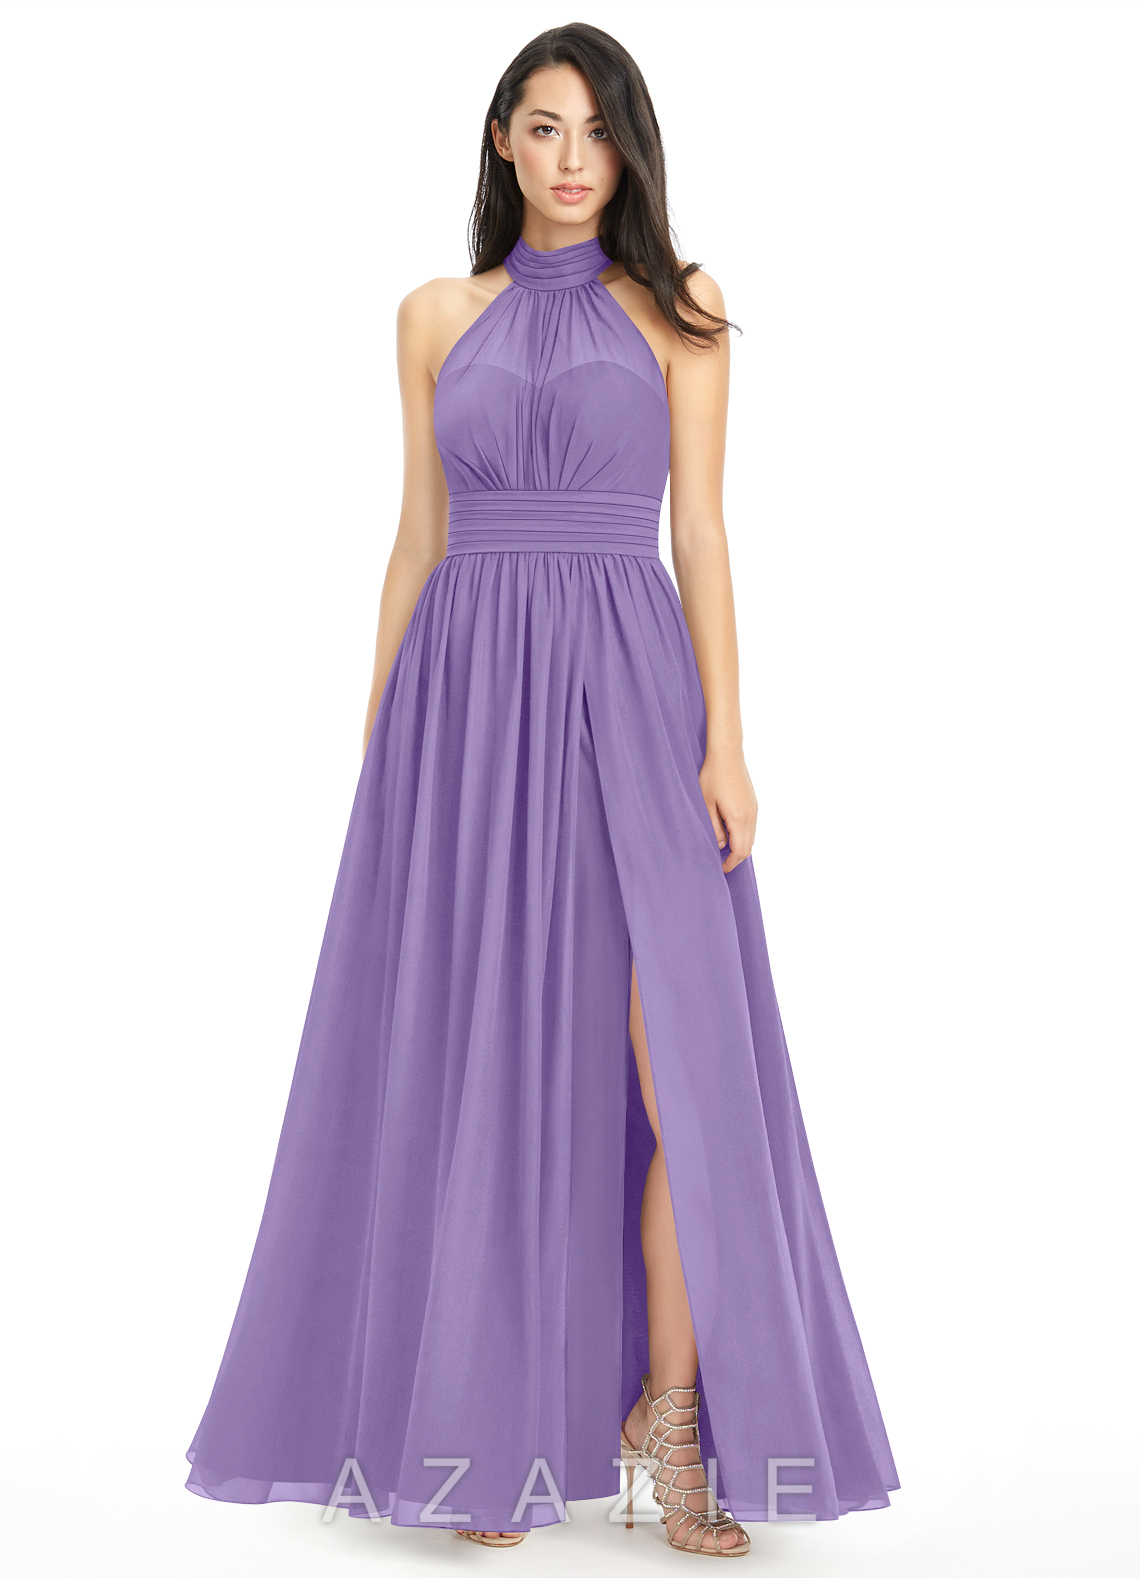 Tahiti Bridesmaid Dresses & Tahiti Gowns | Azazie